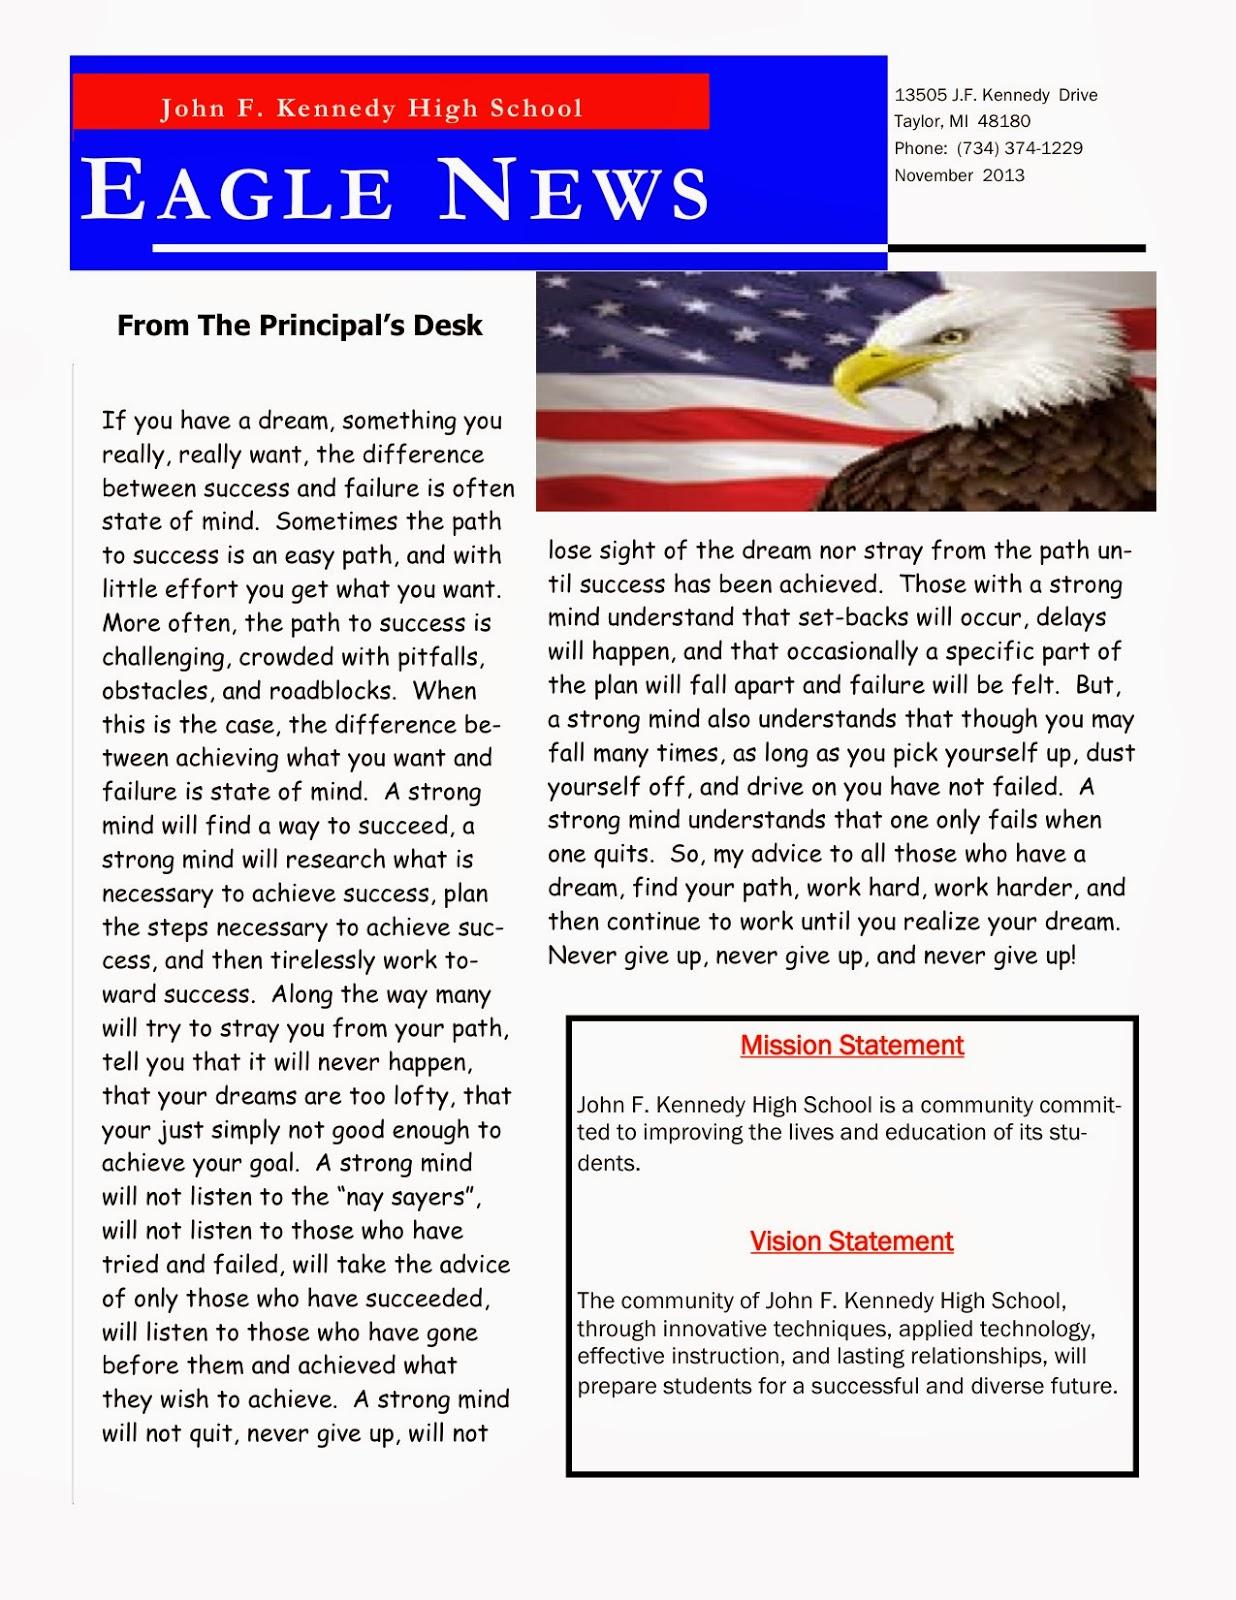 talking taylor schools kennedy high school november newsletter